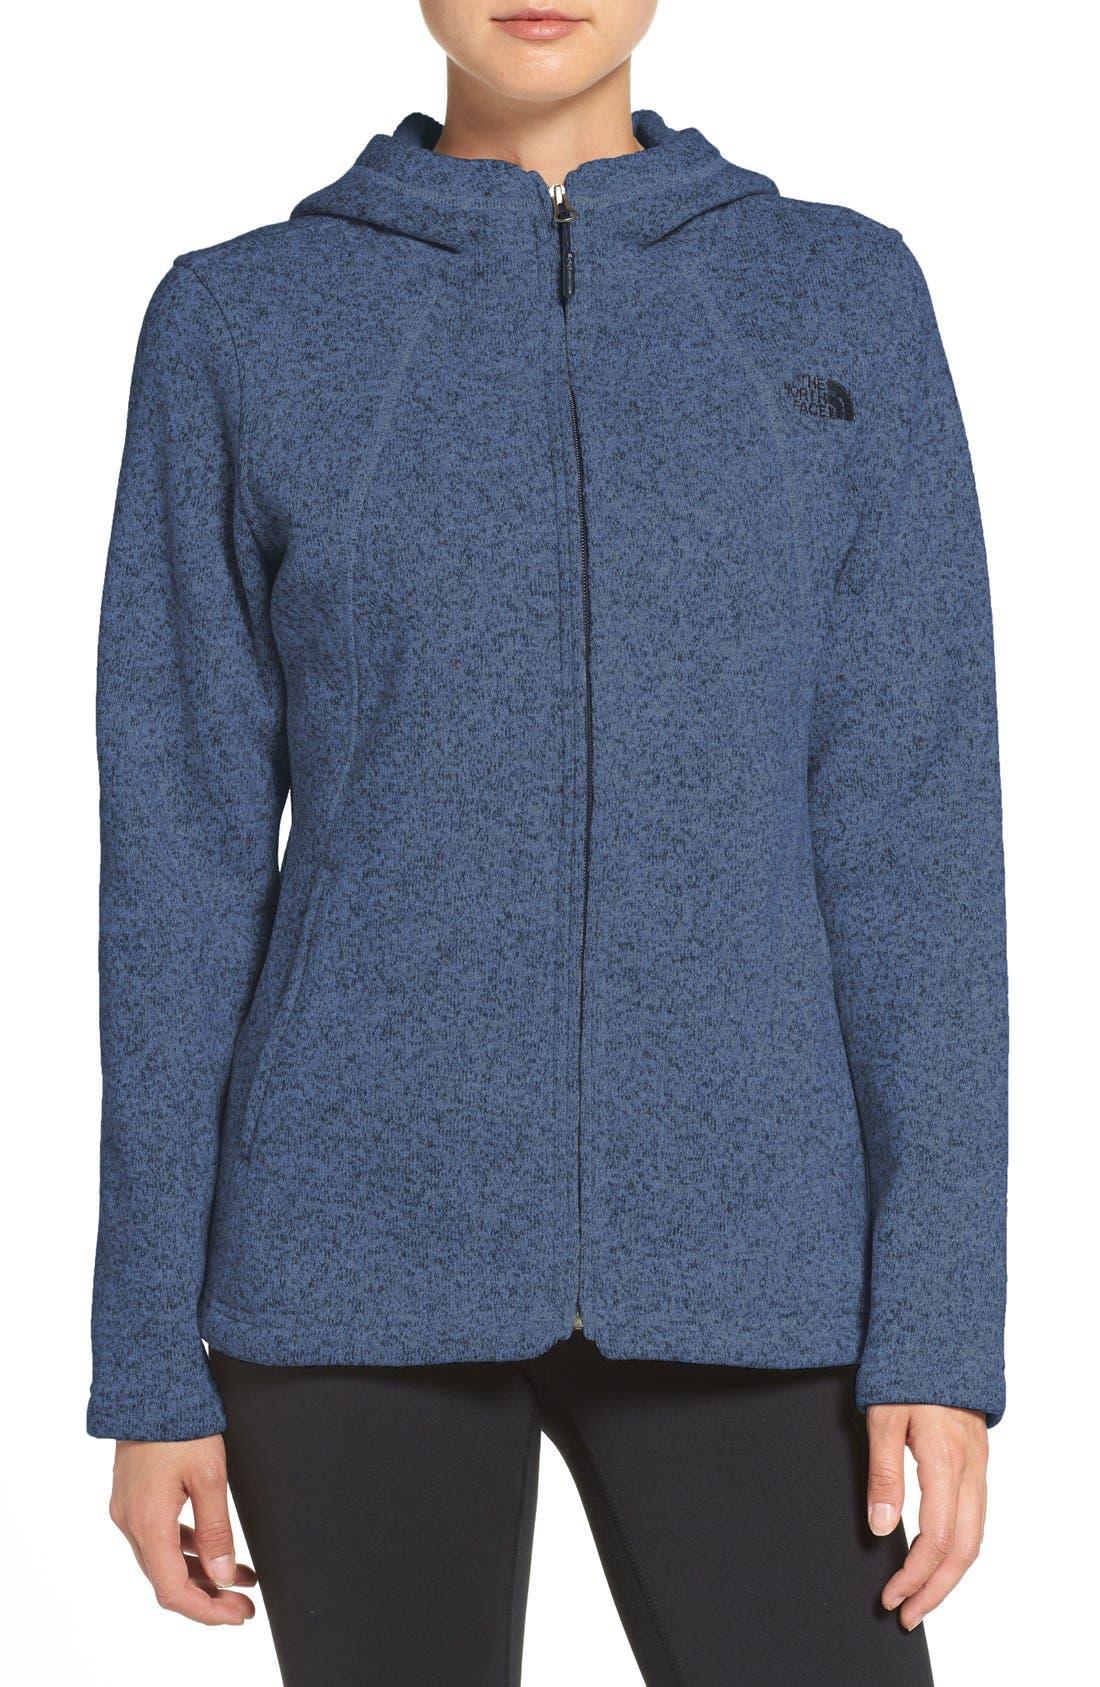 'Crescent' Fleece Jacket,                             Main thumbnail 7, color,